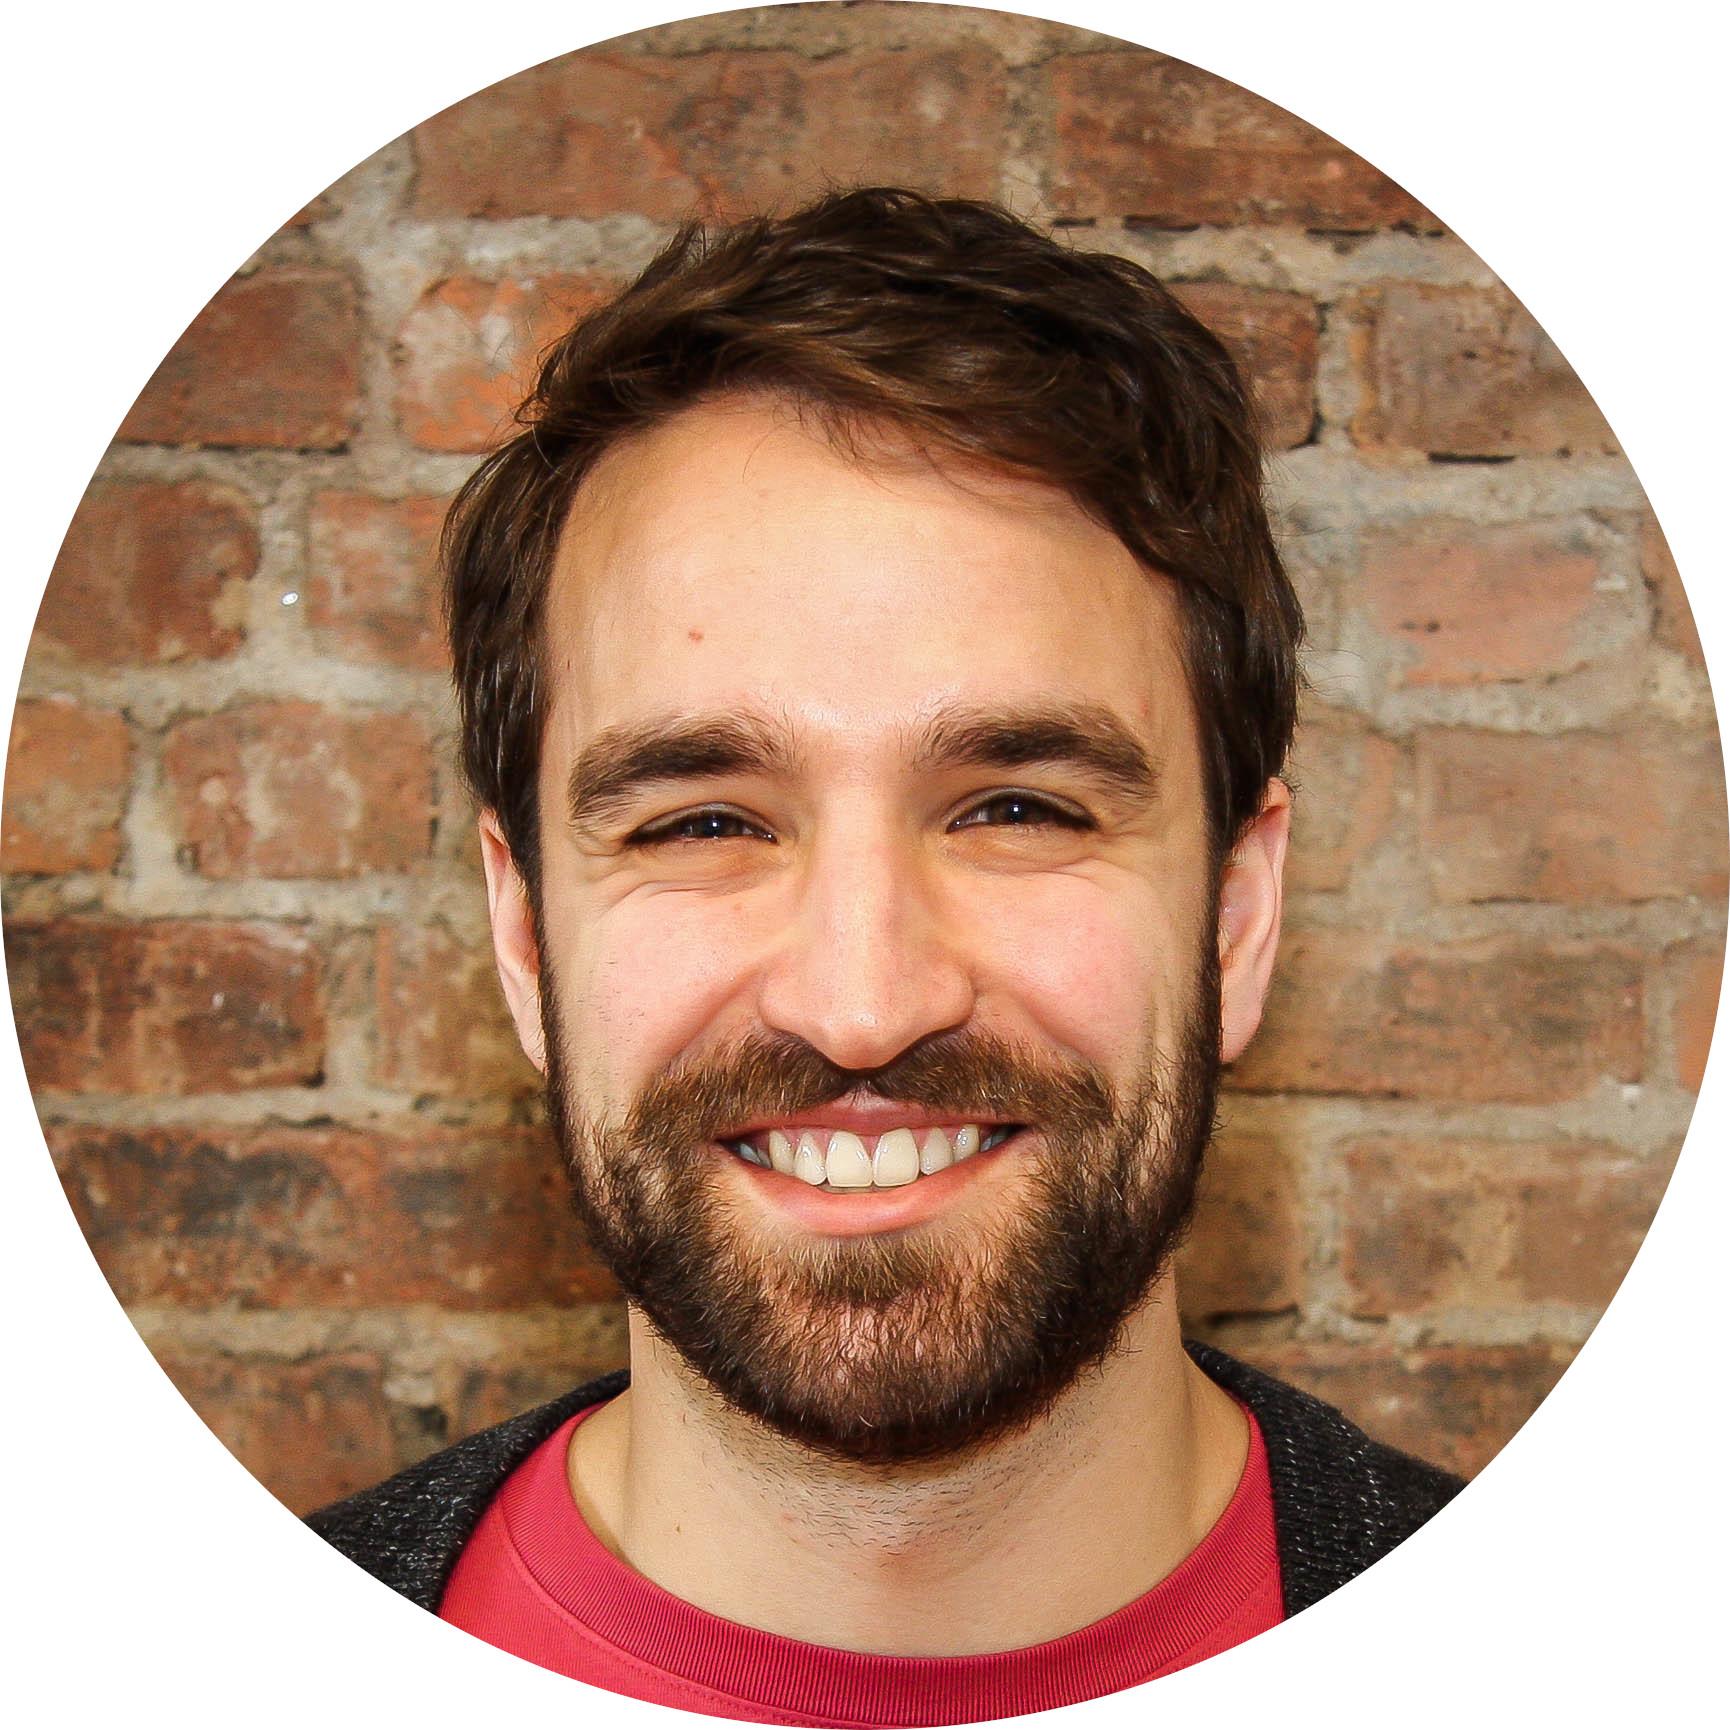 Matrix Factorization in PyTorch | Ethan Rosenthal